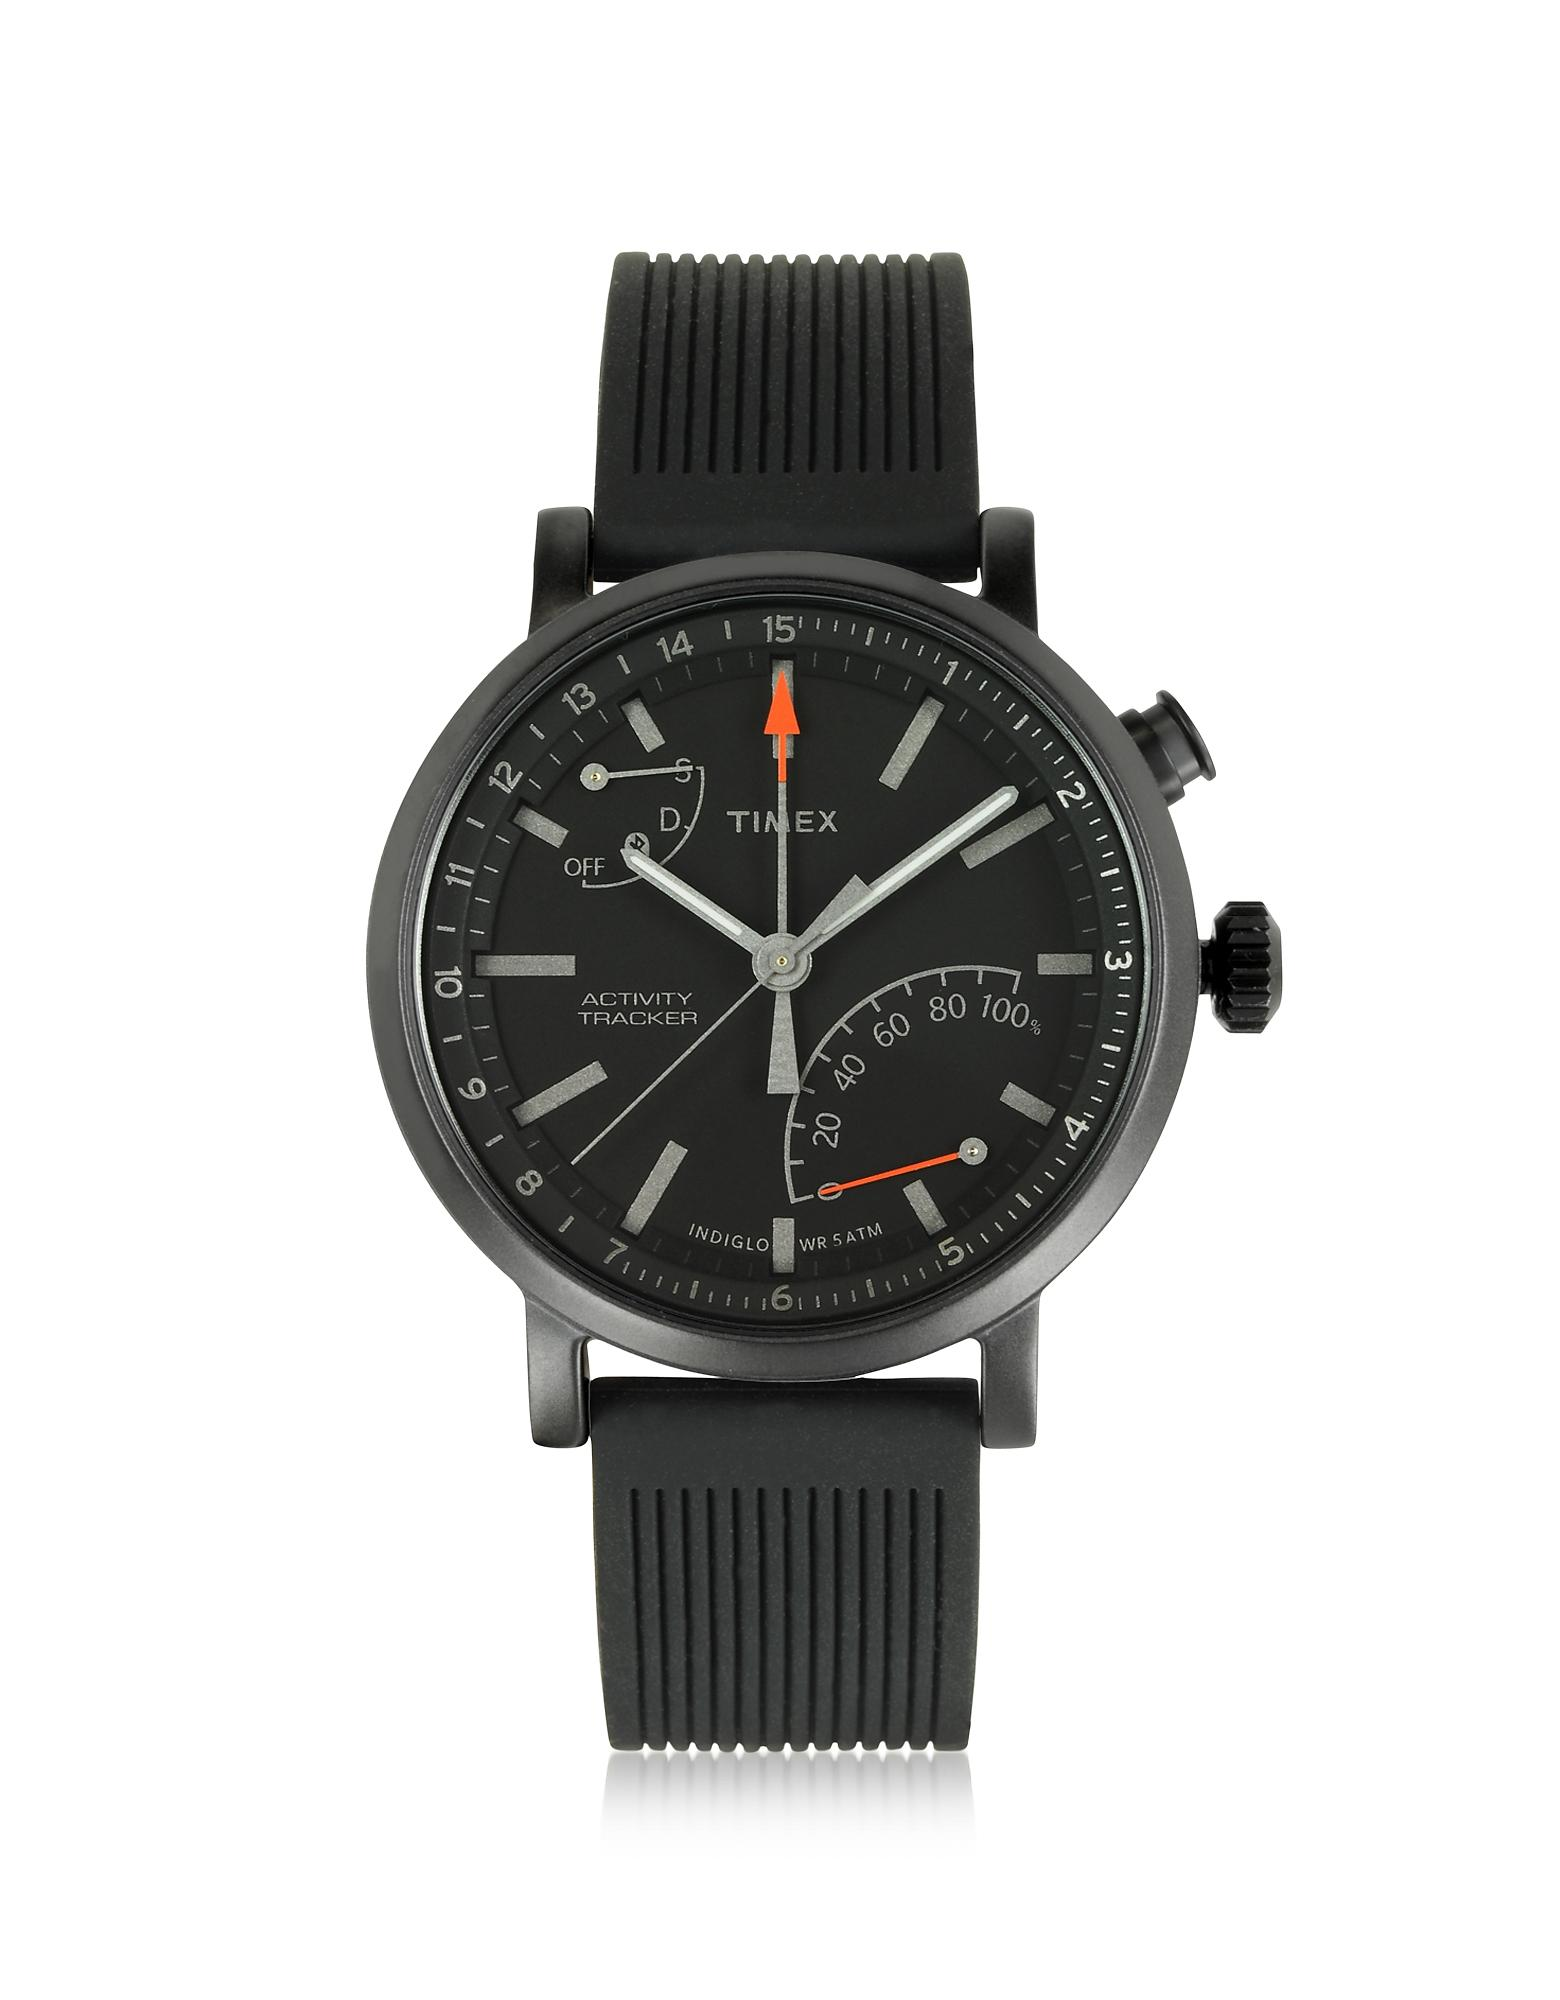 acc94850350a Metropolitan Reloj para Hombre Negro con Correa Intercambiable Timex ...